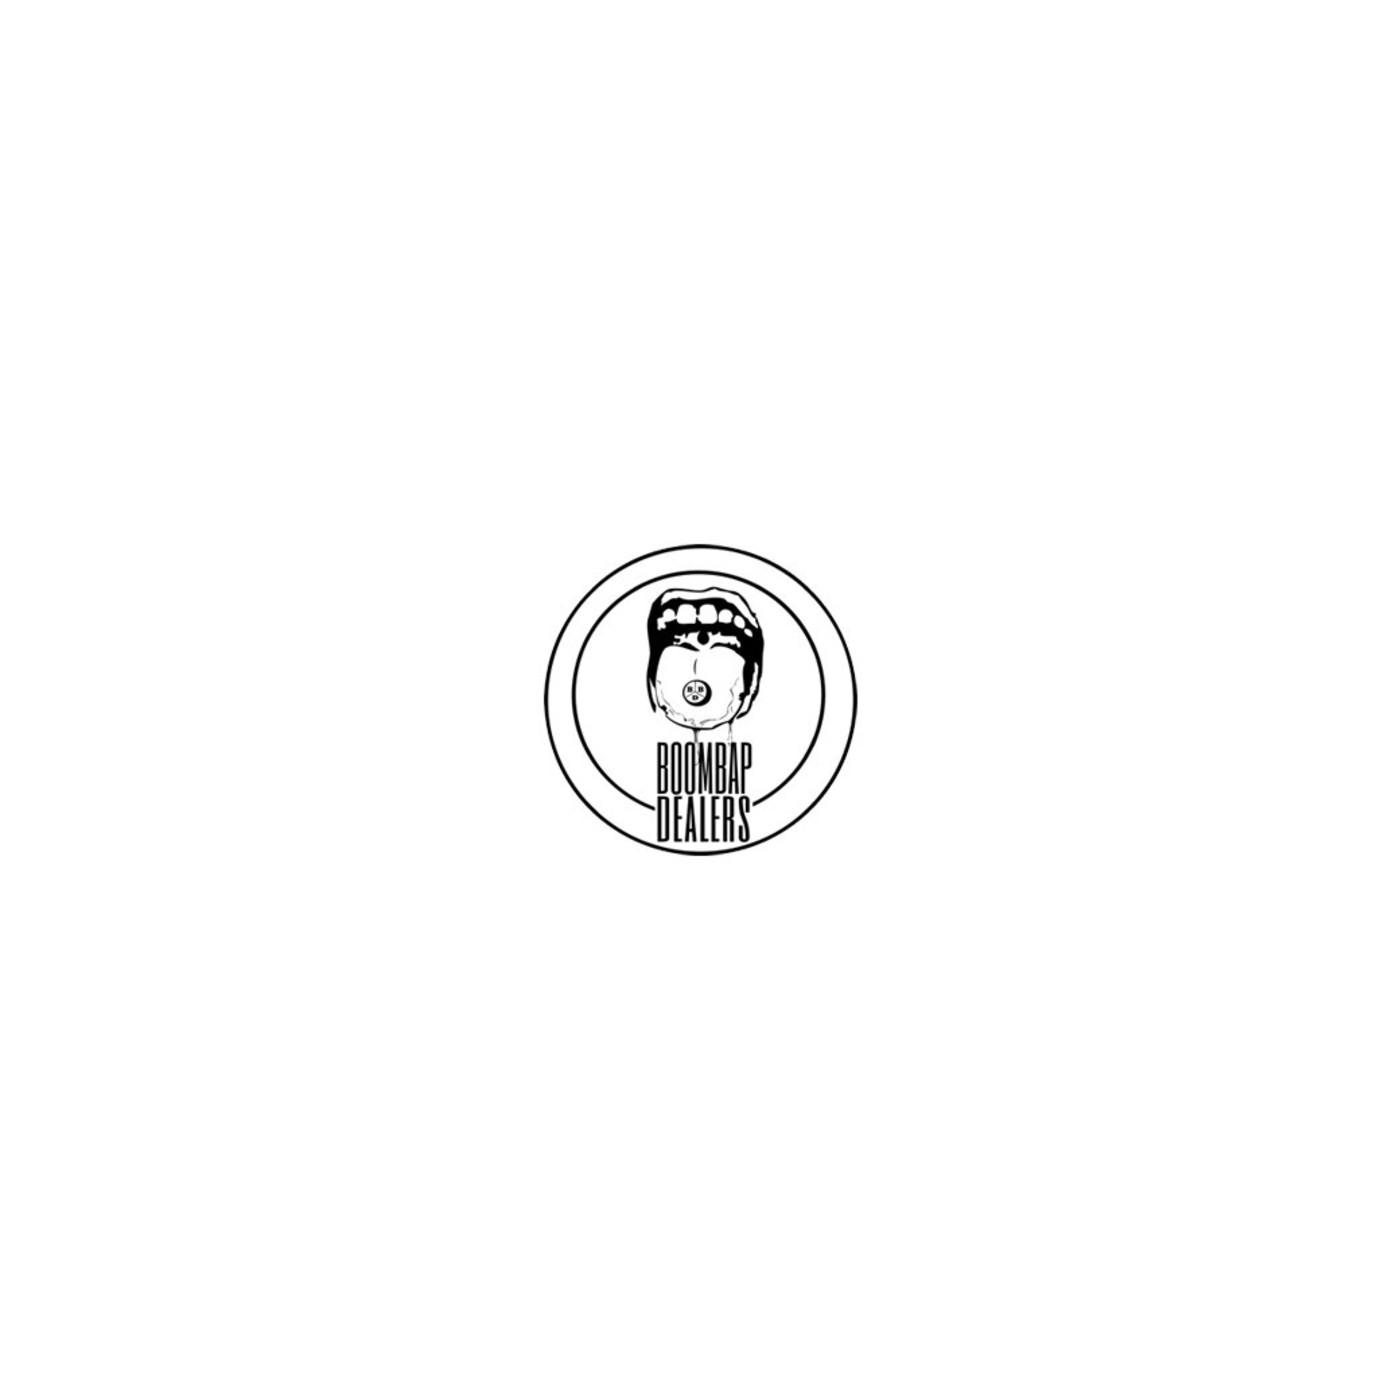 Podcasts BoomBap Dealers Radio Show